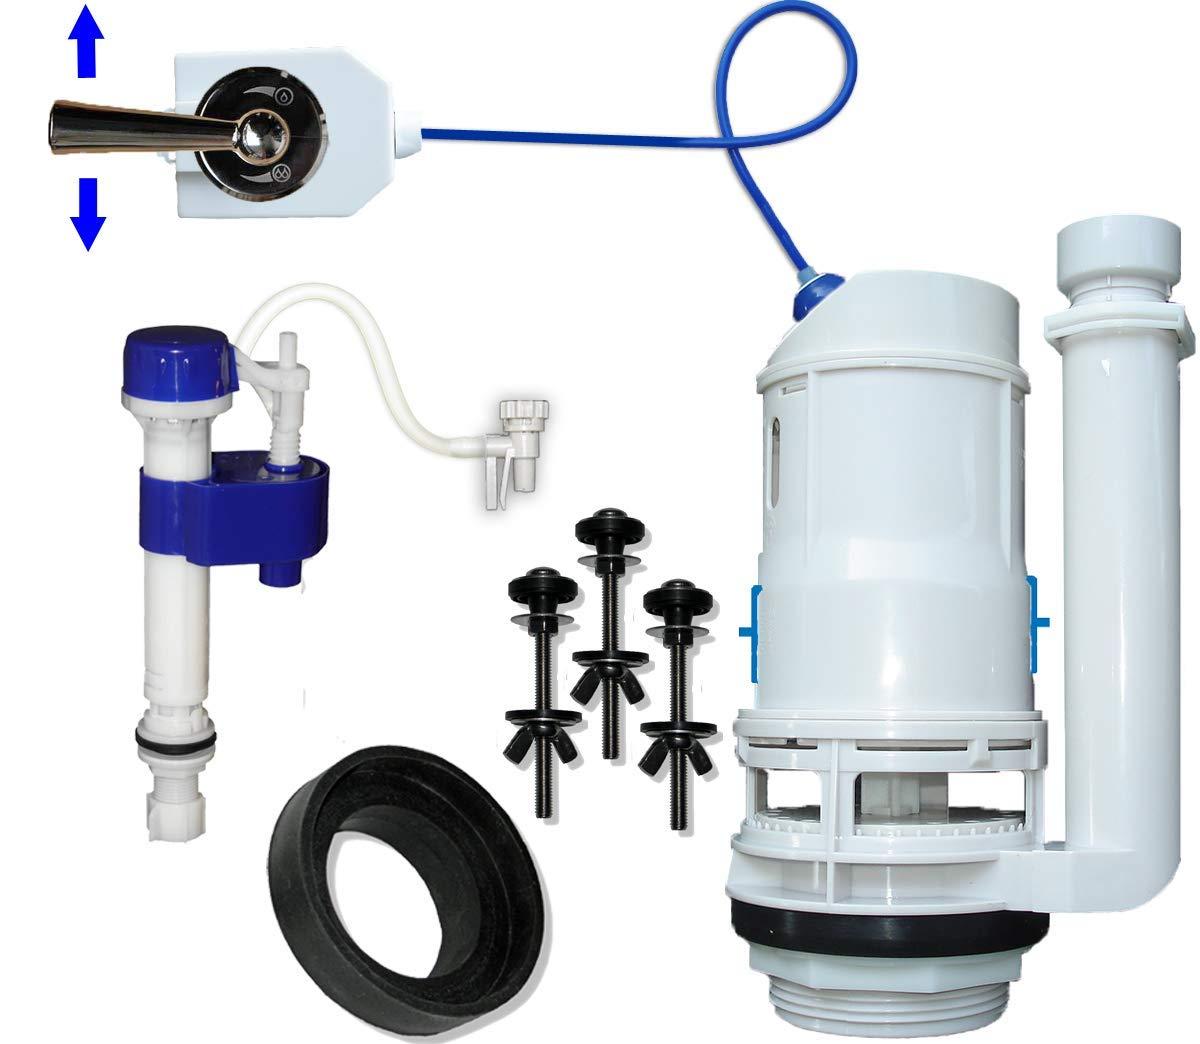 FlushSaver 3'' DRAIN STANDARD LEVER HANDLE Dual-Flush Deluxe DIY Conversion Kit - FITS STANDARD 3'' DRAIN TWO PIECE TOILETS. Converts standard toilets into efficient dual-flush systems. by Flush*Saver